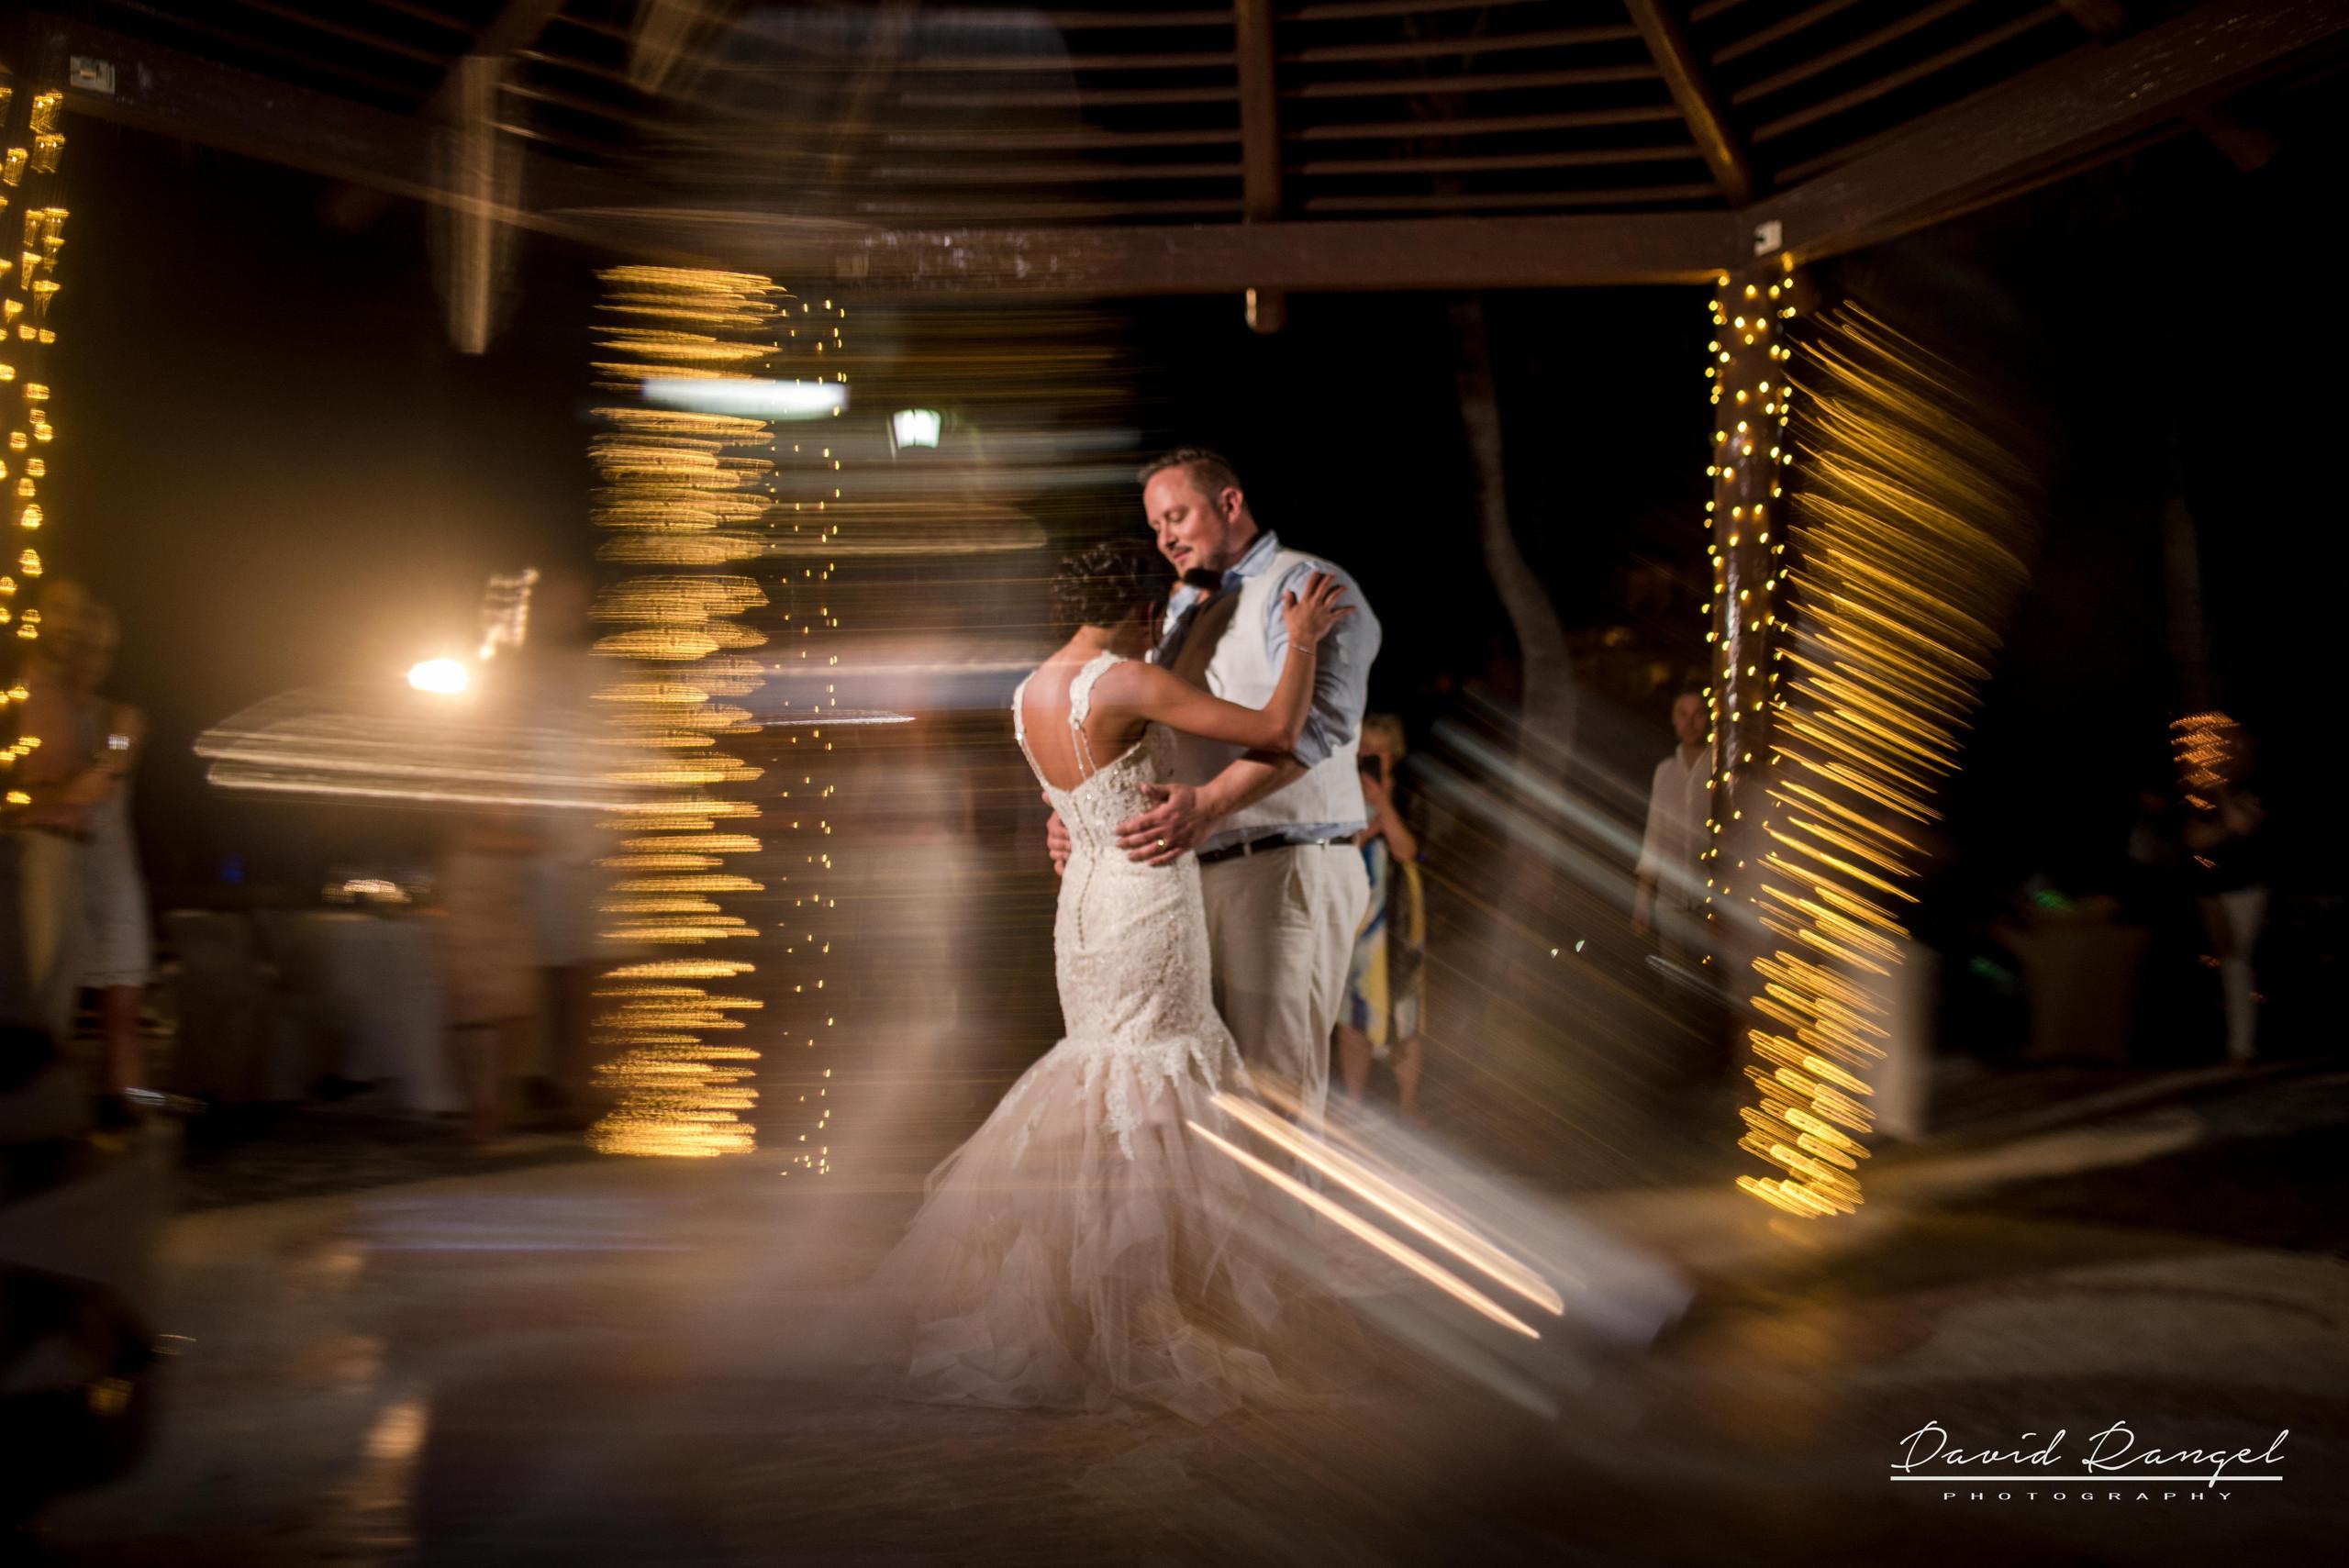 wedding+photo+bride+groom+reception+frame+first+dance